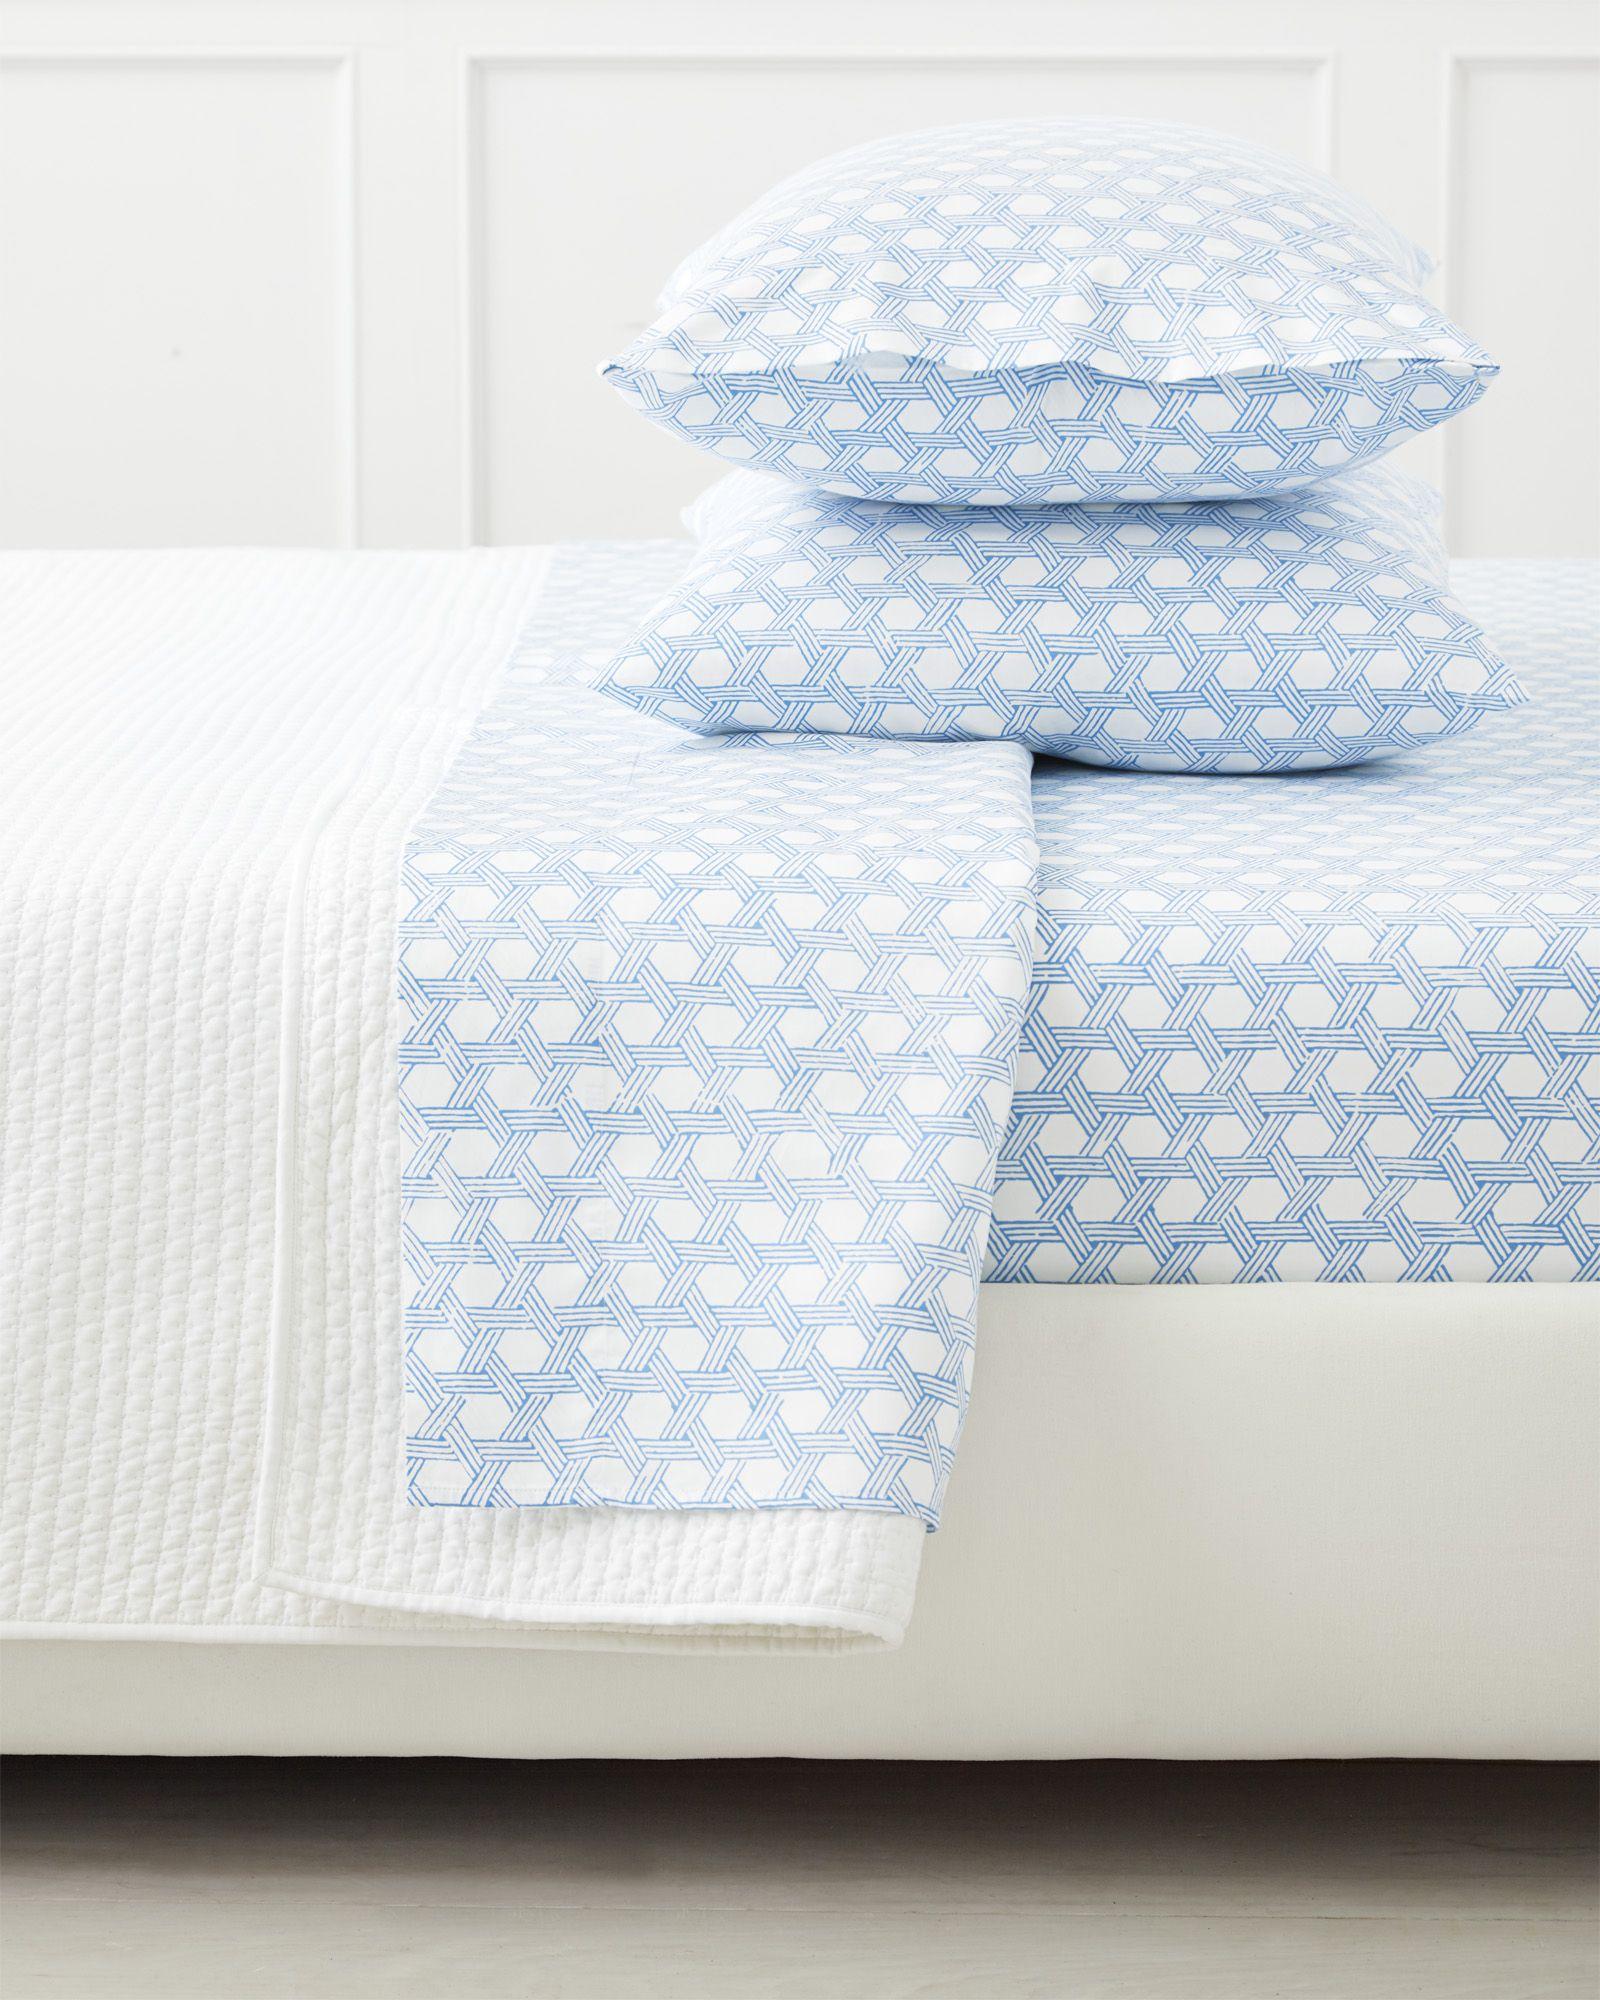 Cayman Sheet SetCayman Sheet Set Bed sheet sets, Sheet